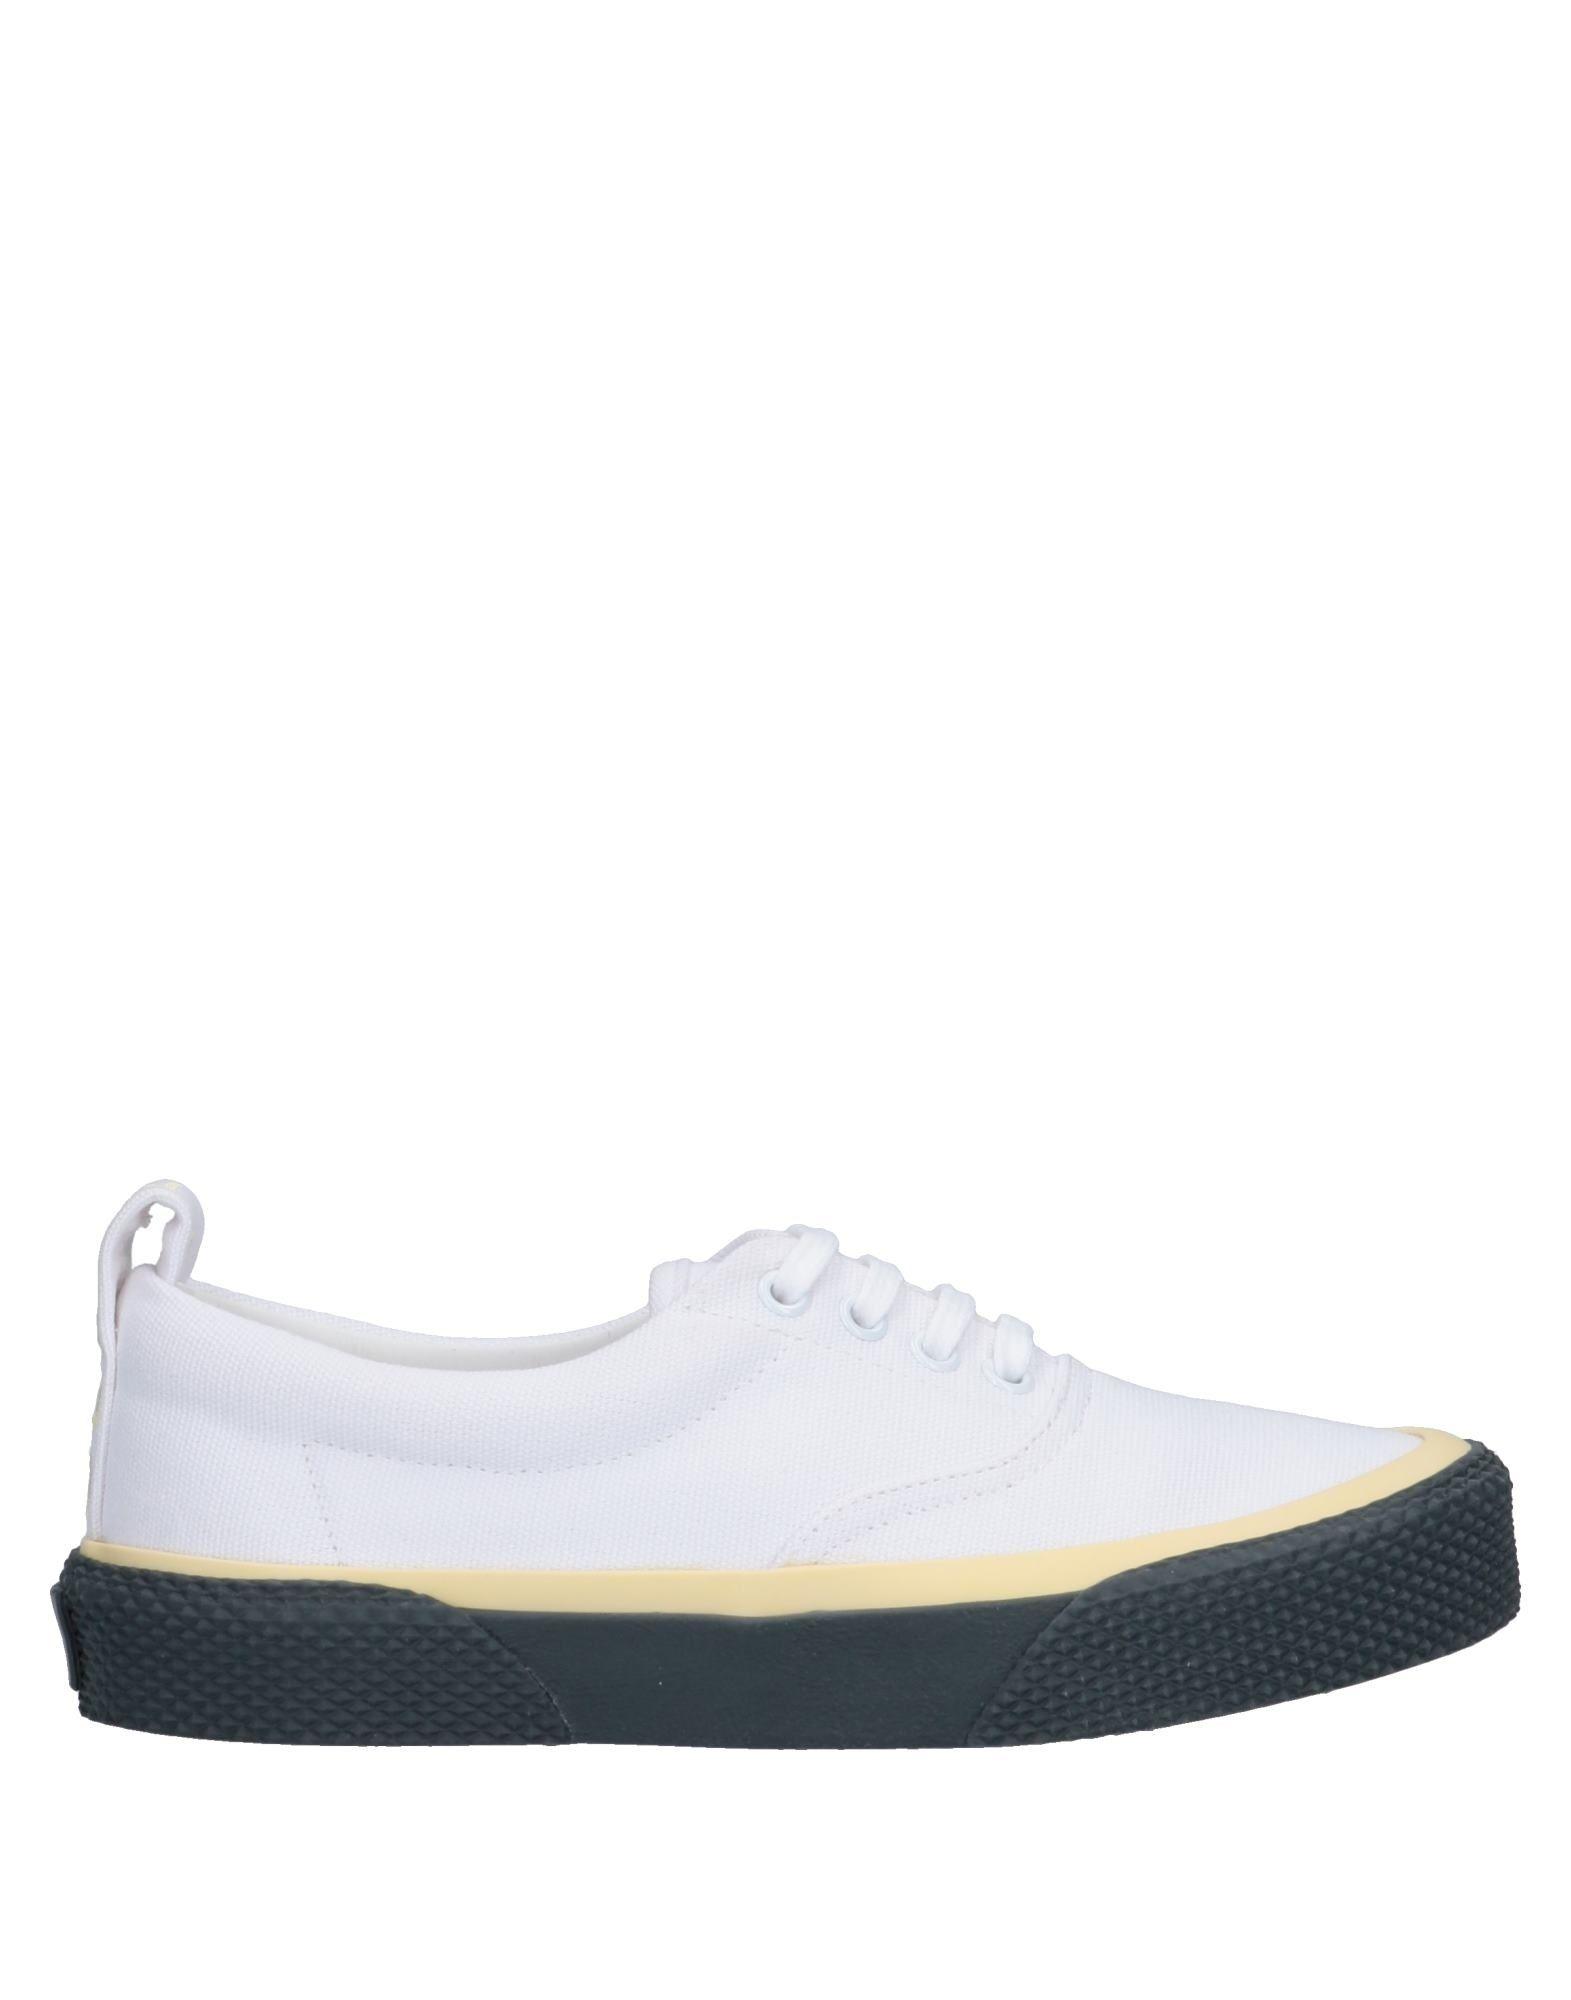 CELINE Низкие кеды и кроссовки nodo низкие кеды и кроссовки